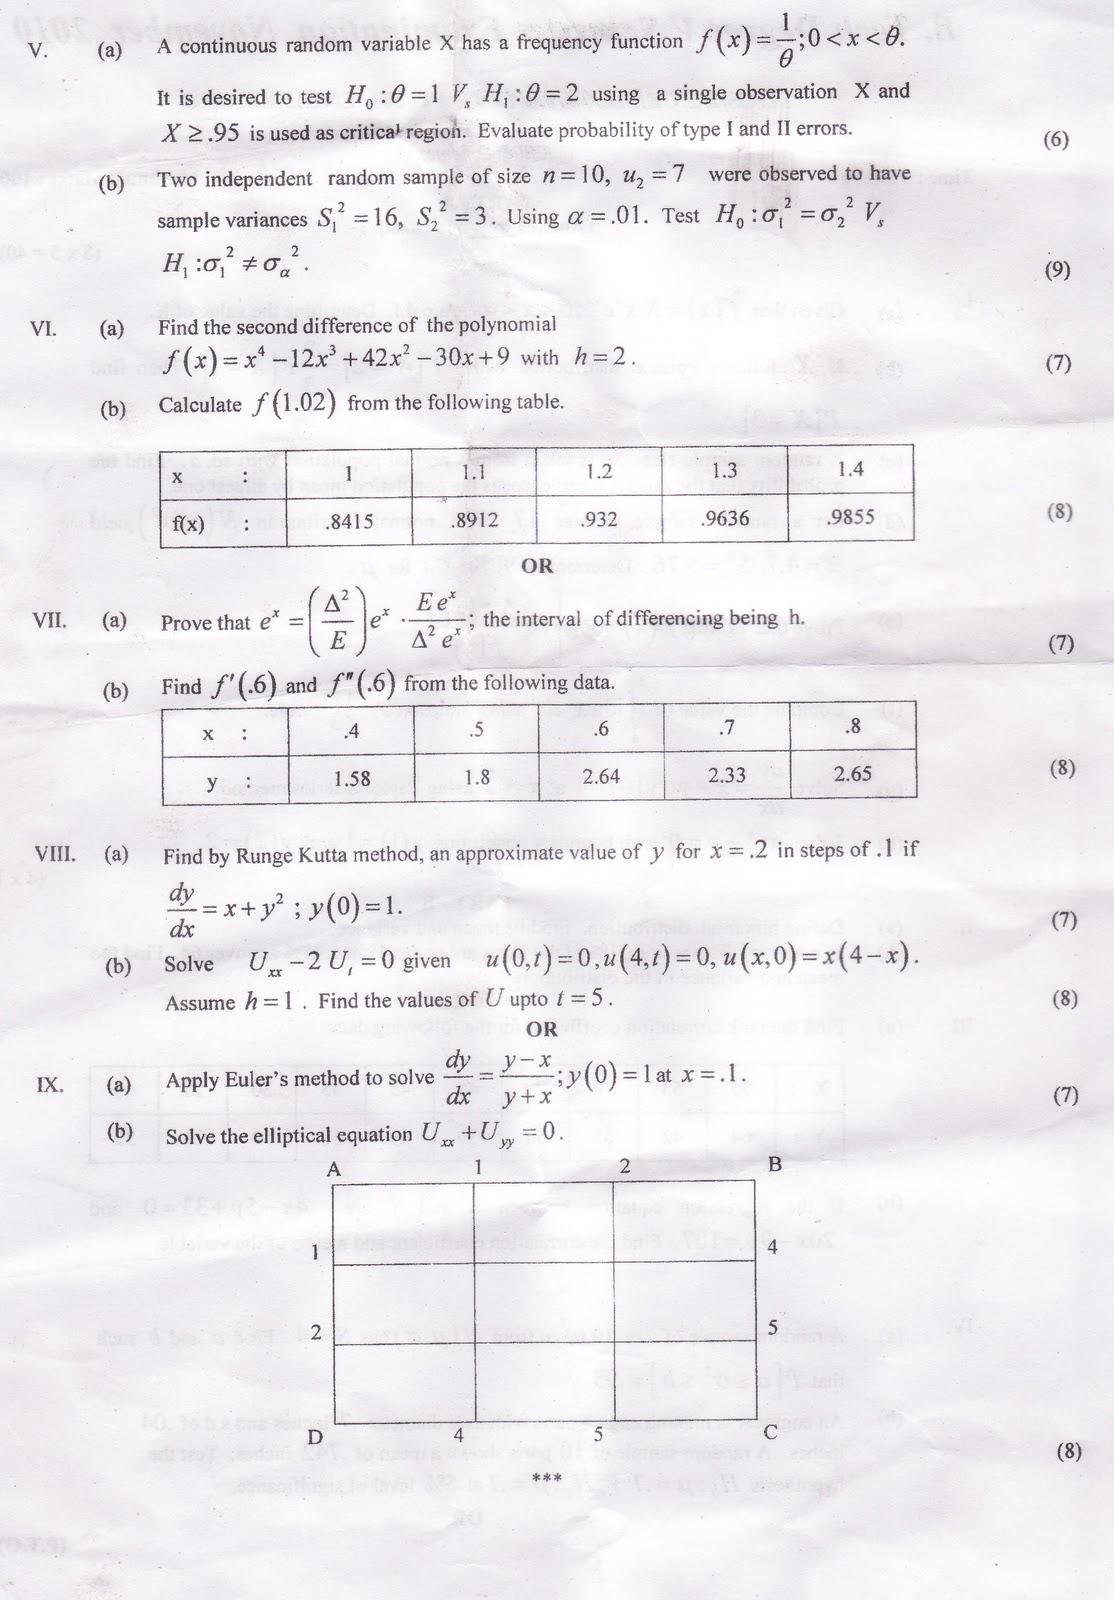 ohmlok: CS 501 Engineering mathematics 2010